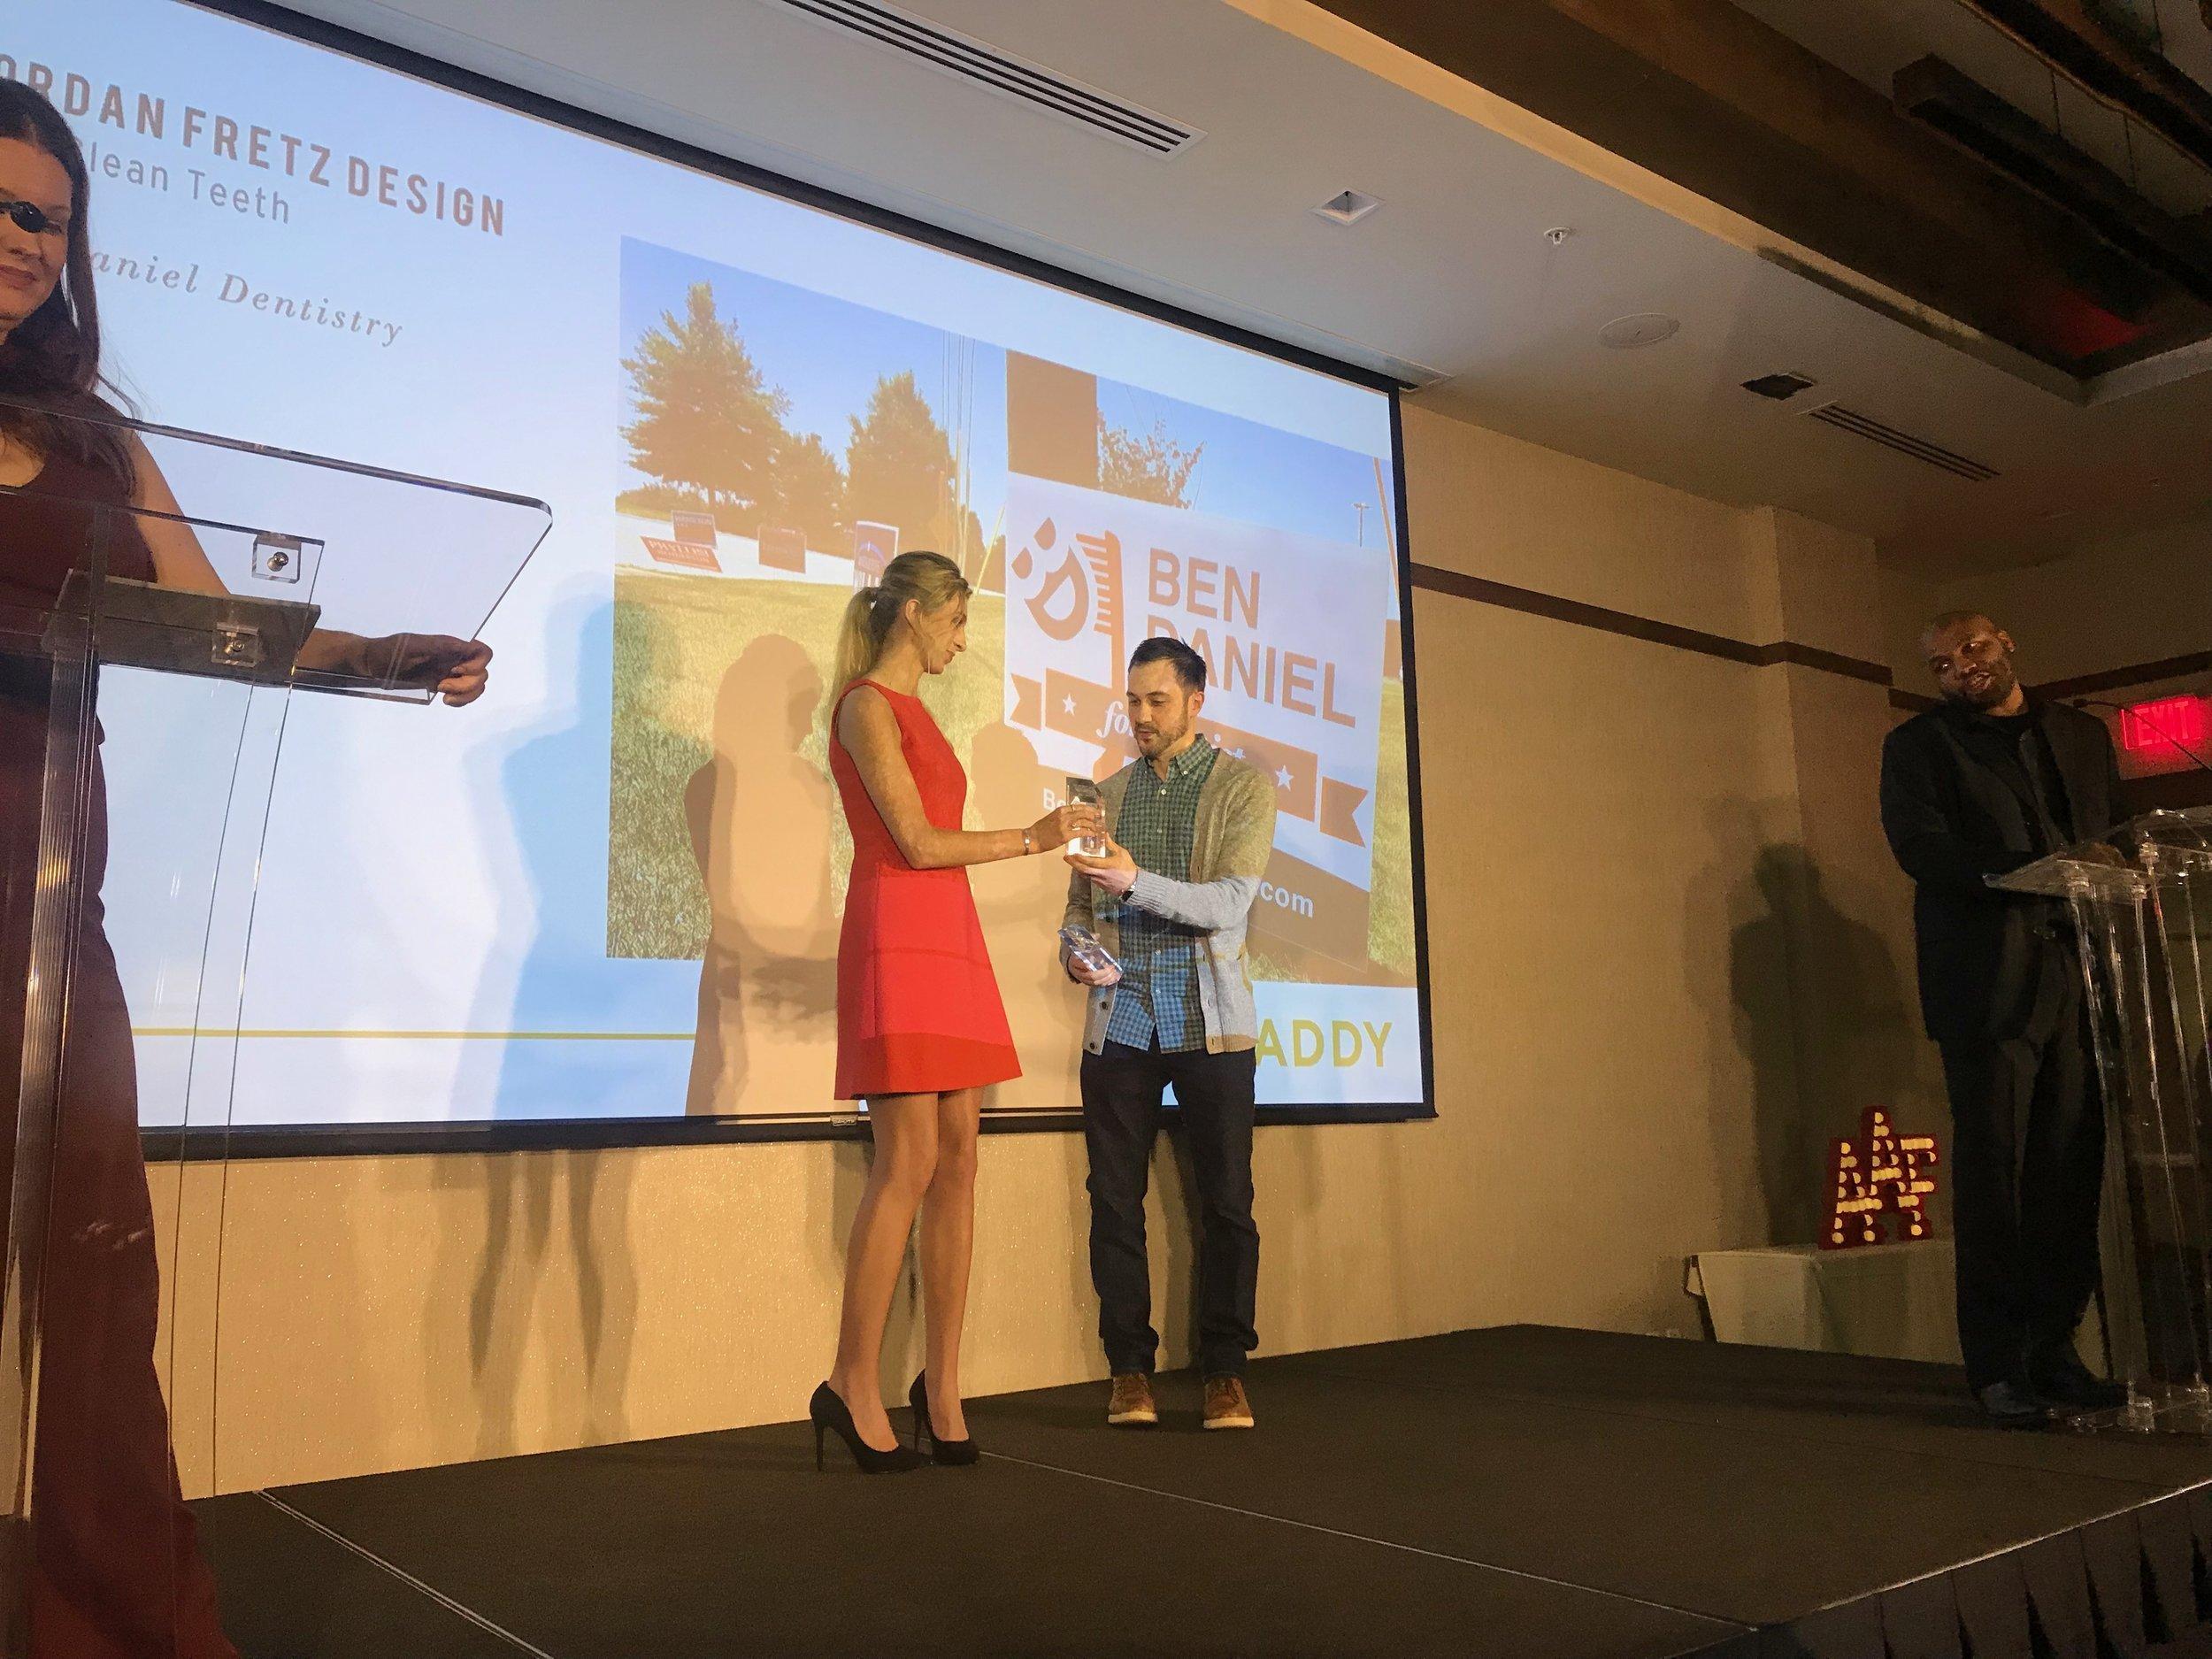 jordan-fretz-addy-awards-greenville.jpg